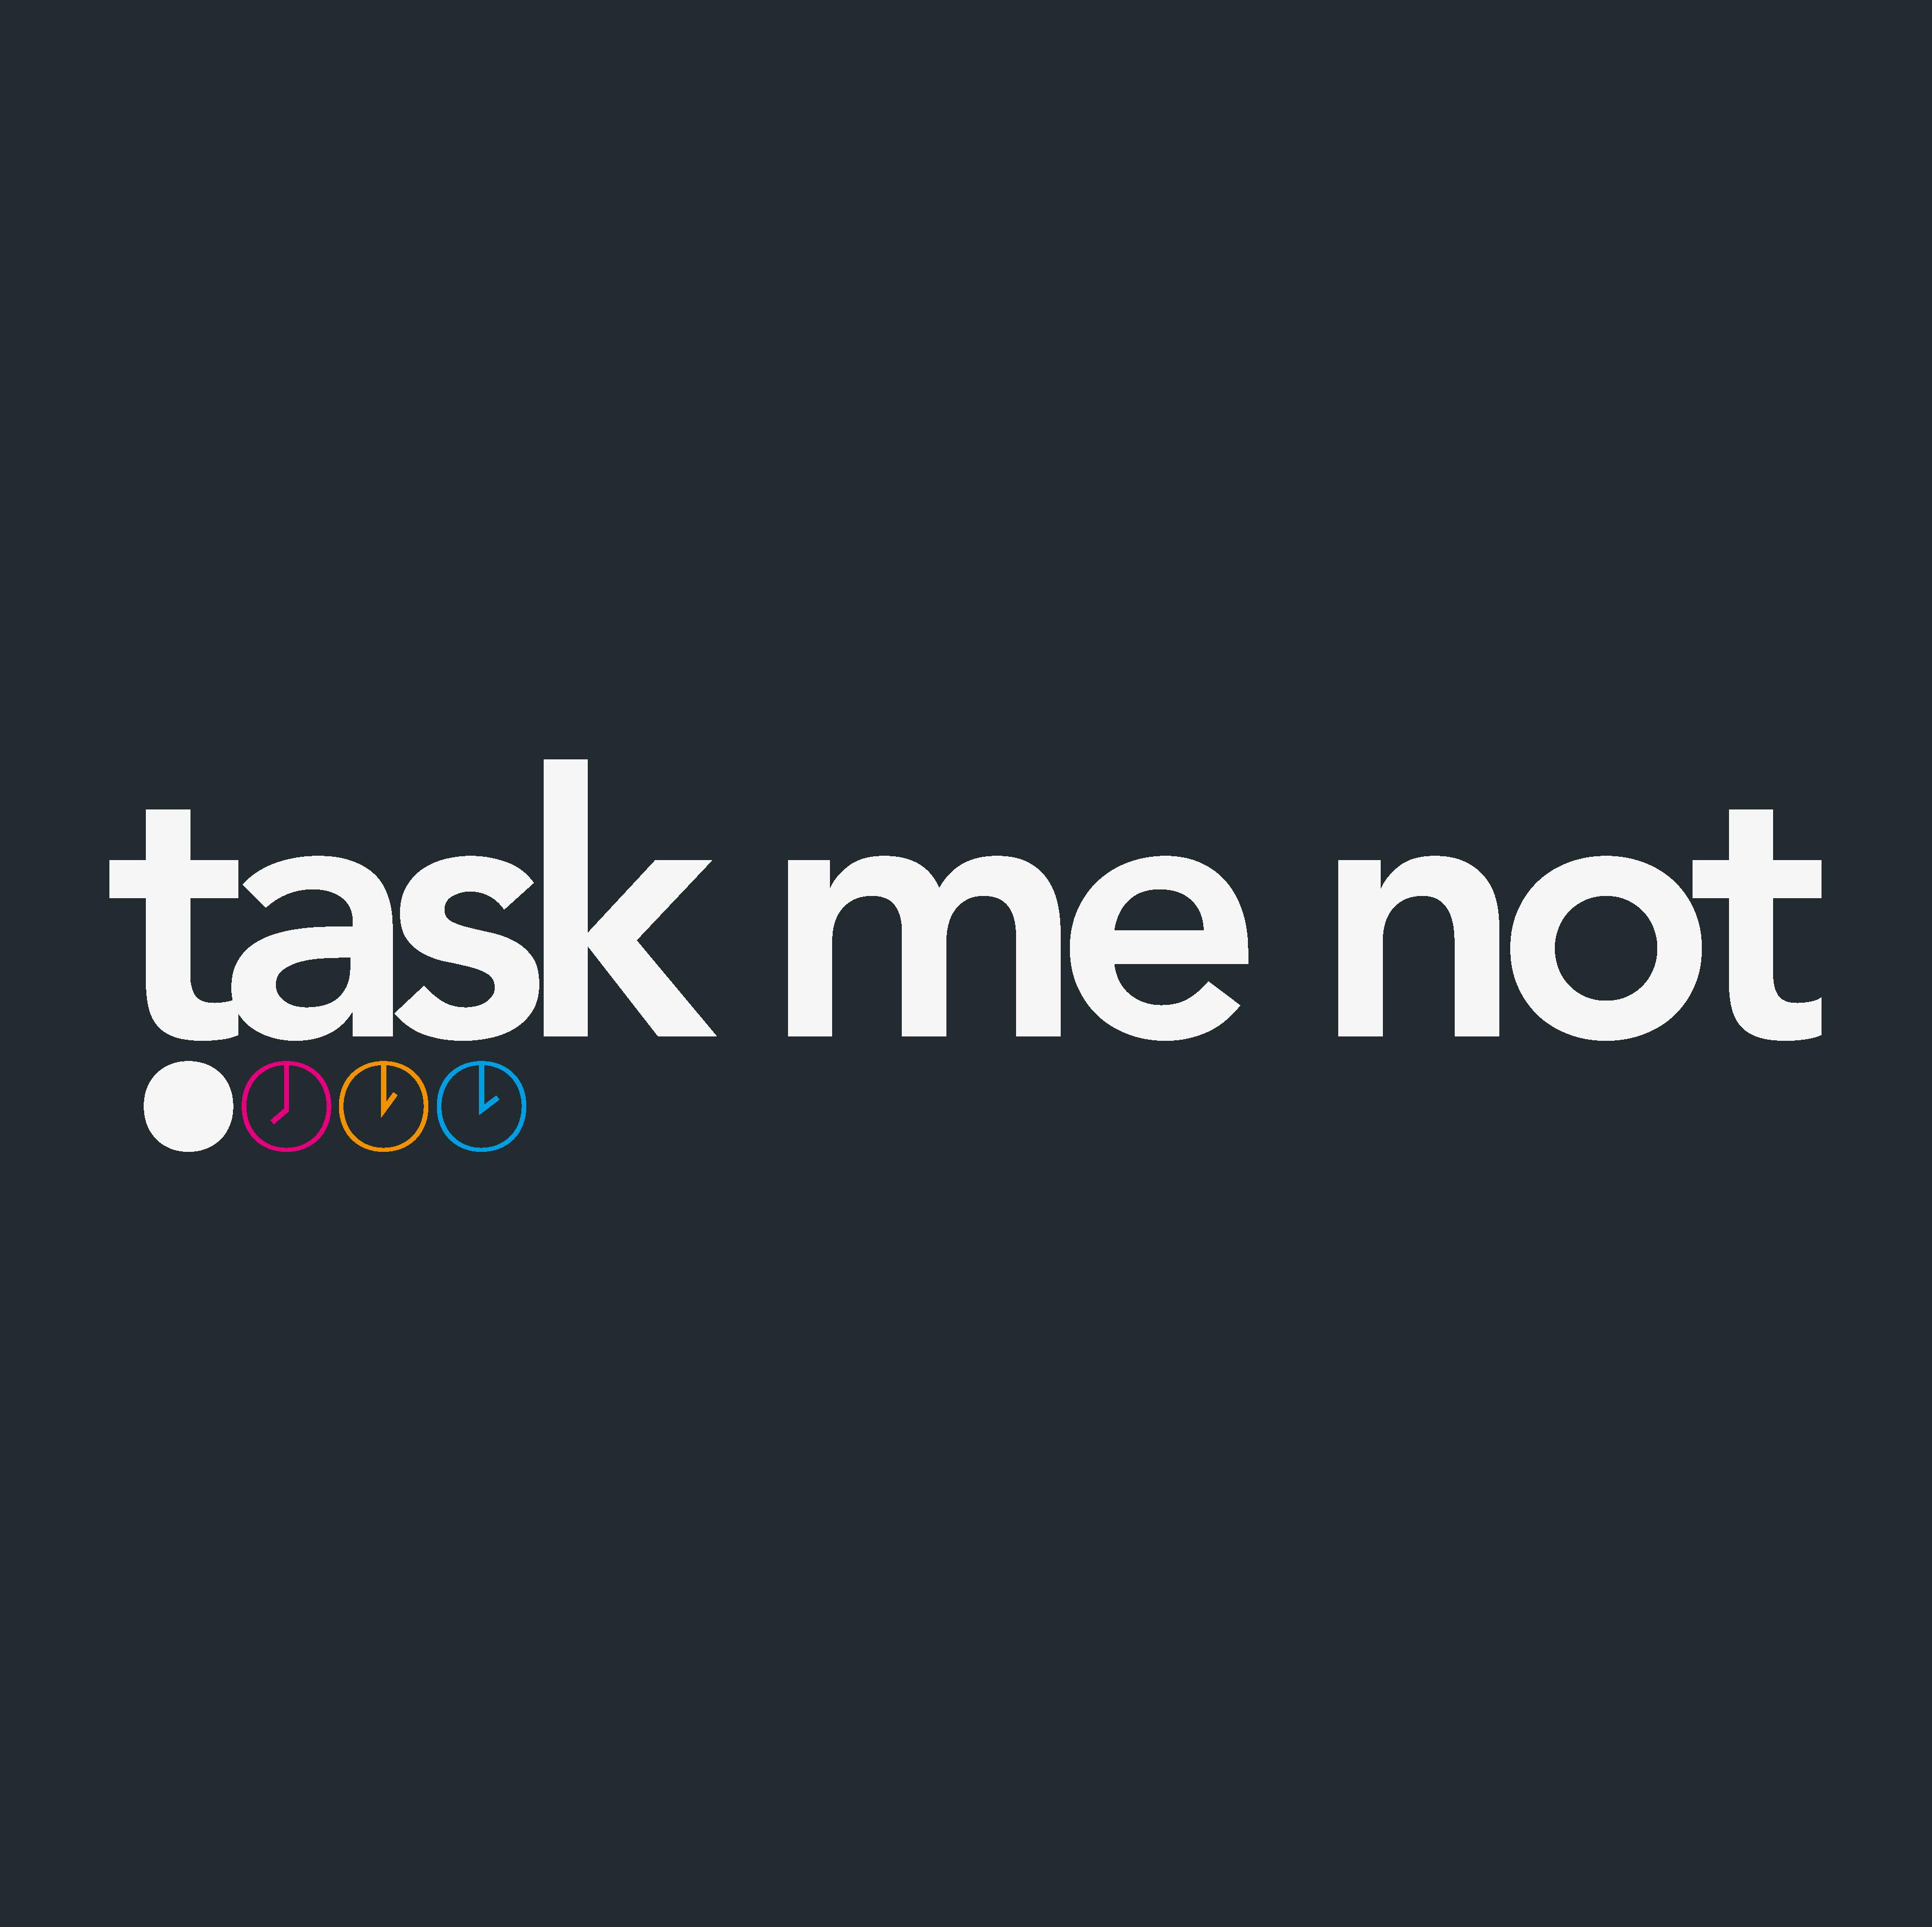 TaskMeNot, delega tus tareas a un asistente virtual